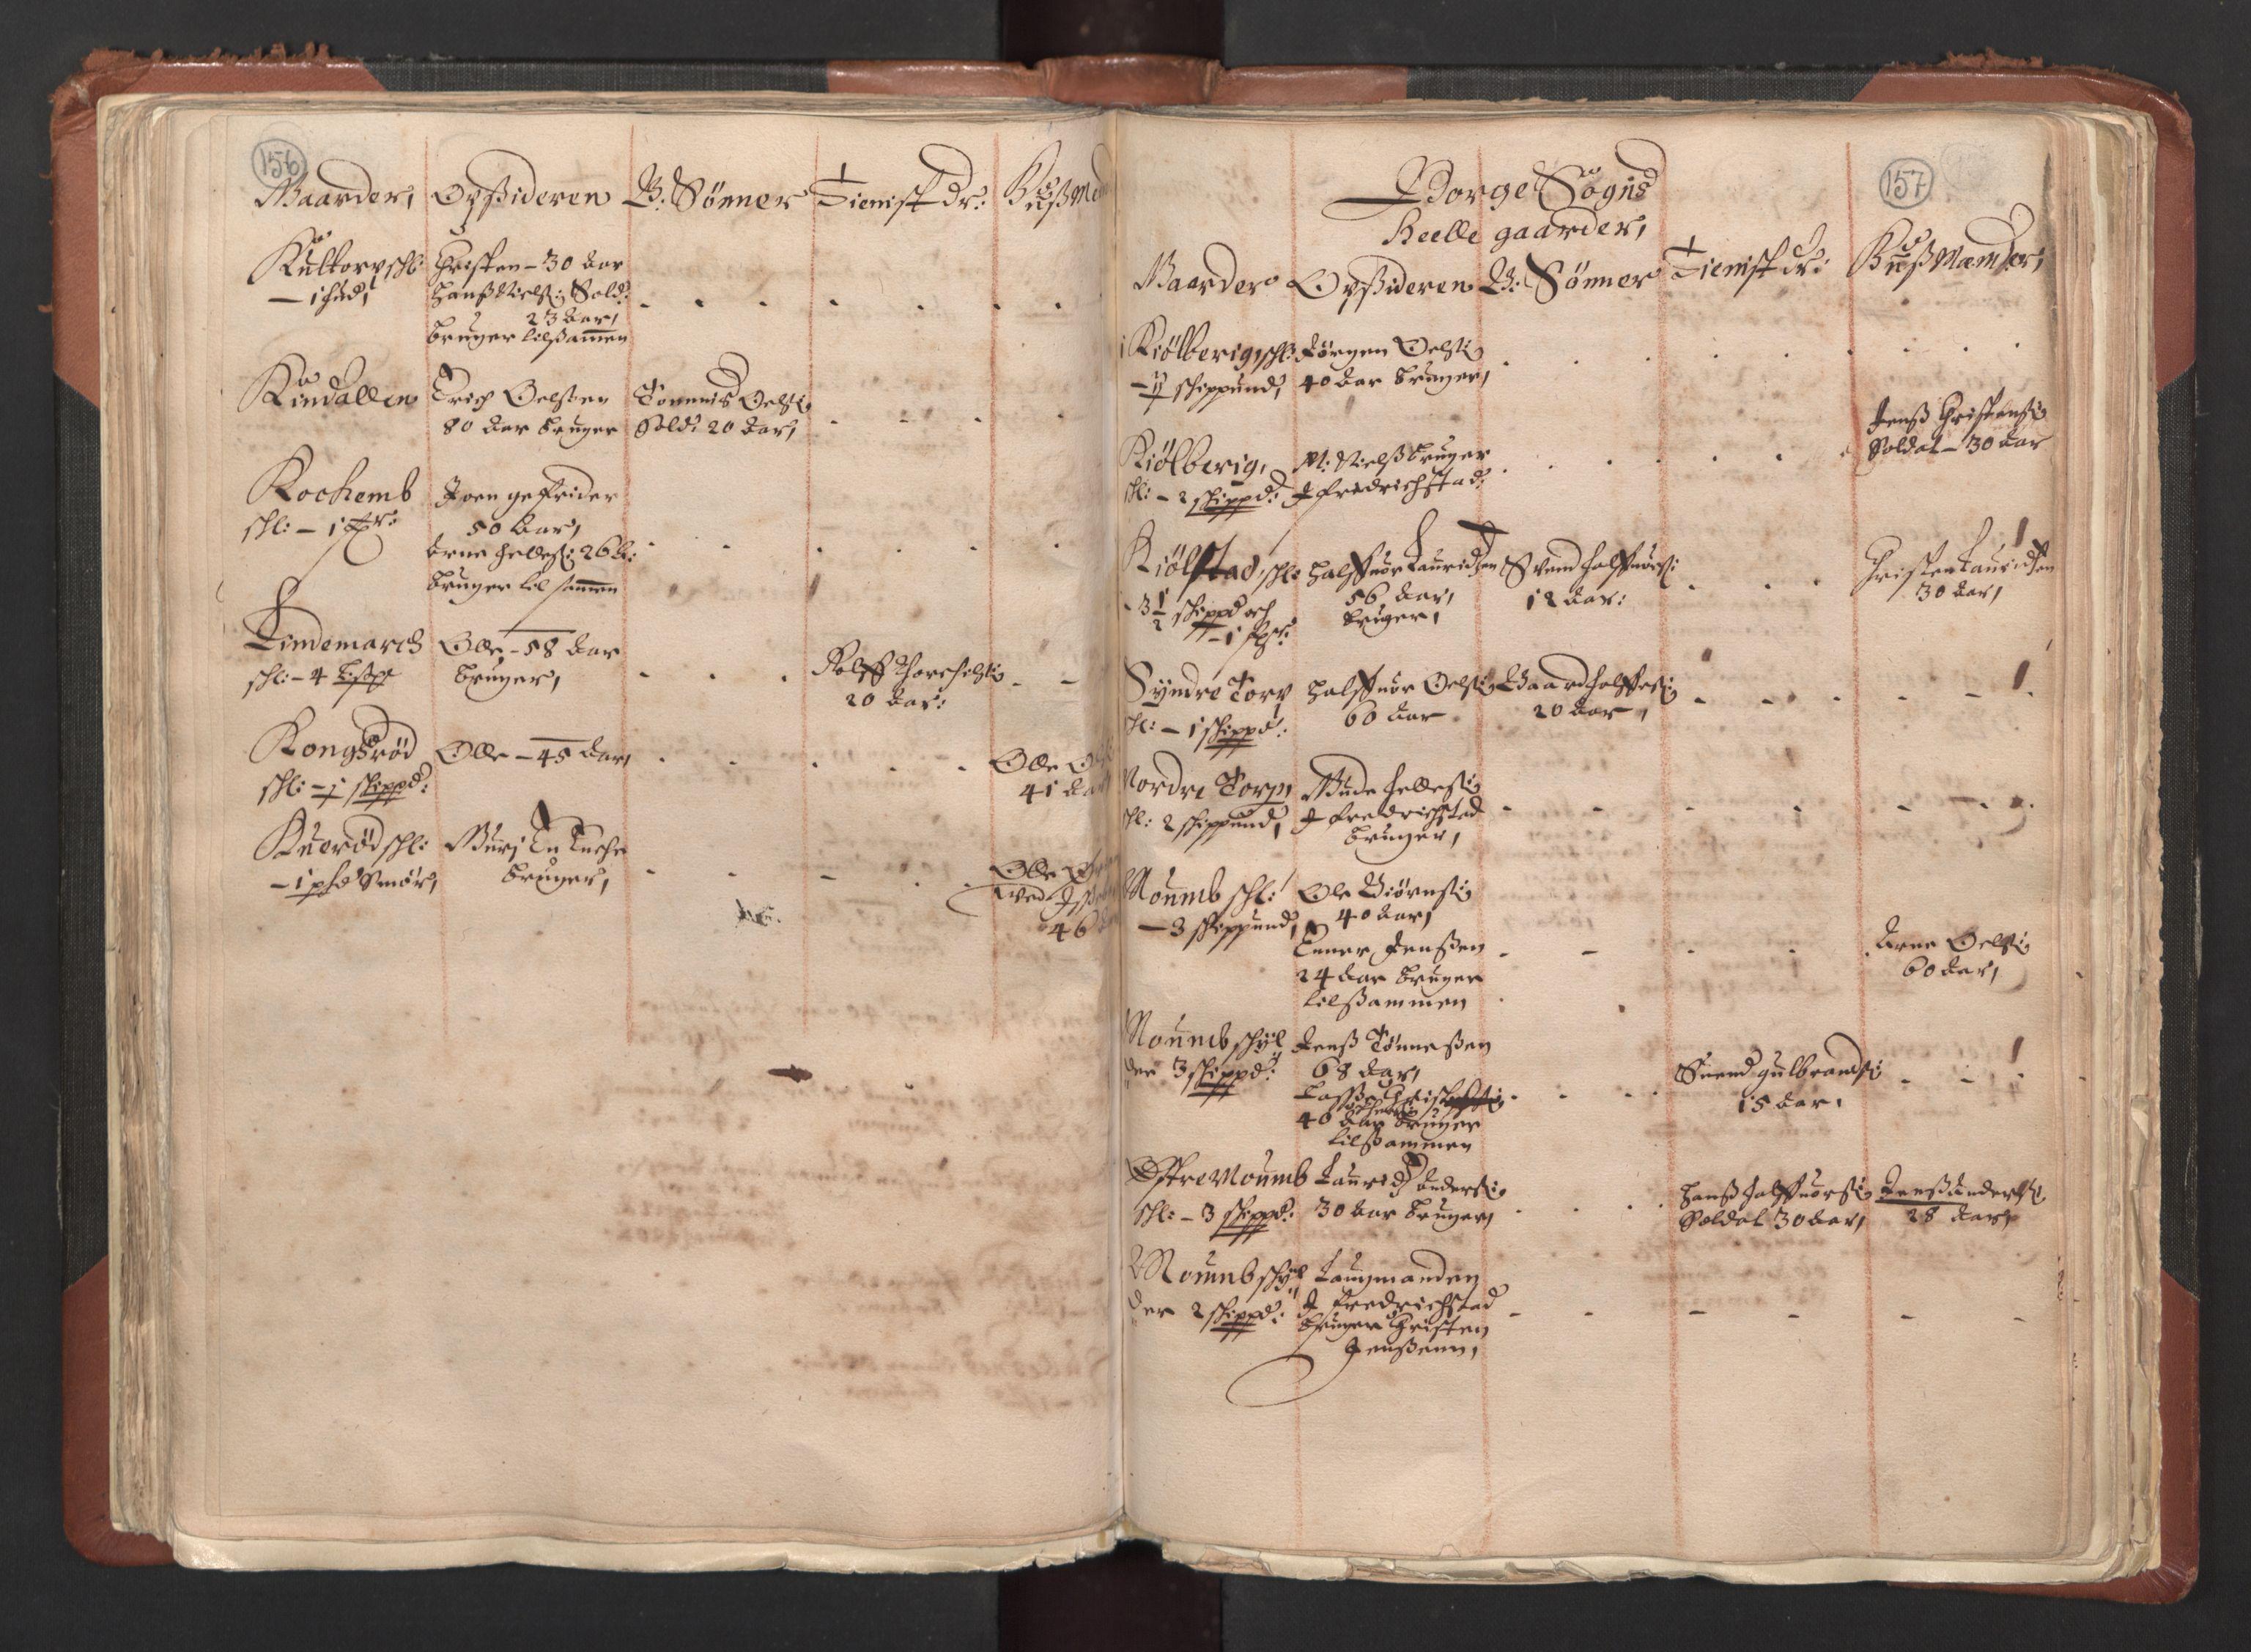 RA, Fogdenes og sorenskrivernes manntall 1664-1666, nr. 1: Fogderier (len og skipreider) i nåværende Østfold fylke, 1664, s. 156-157